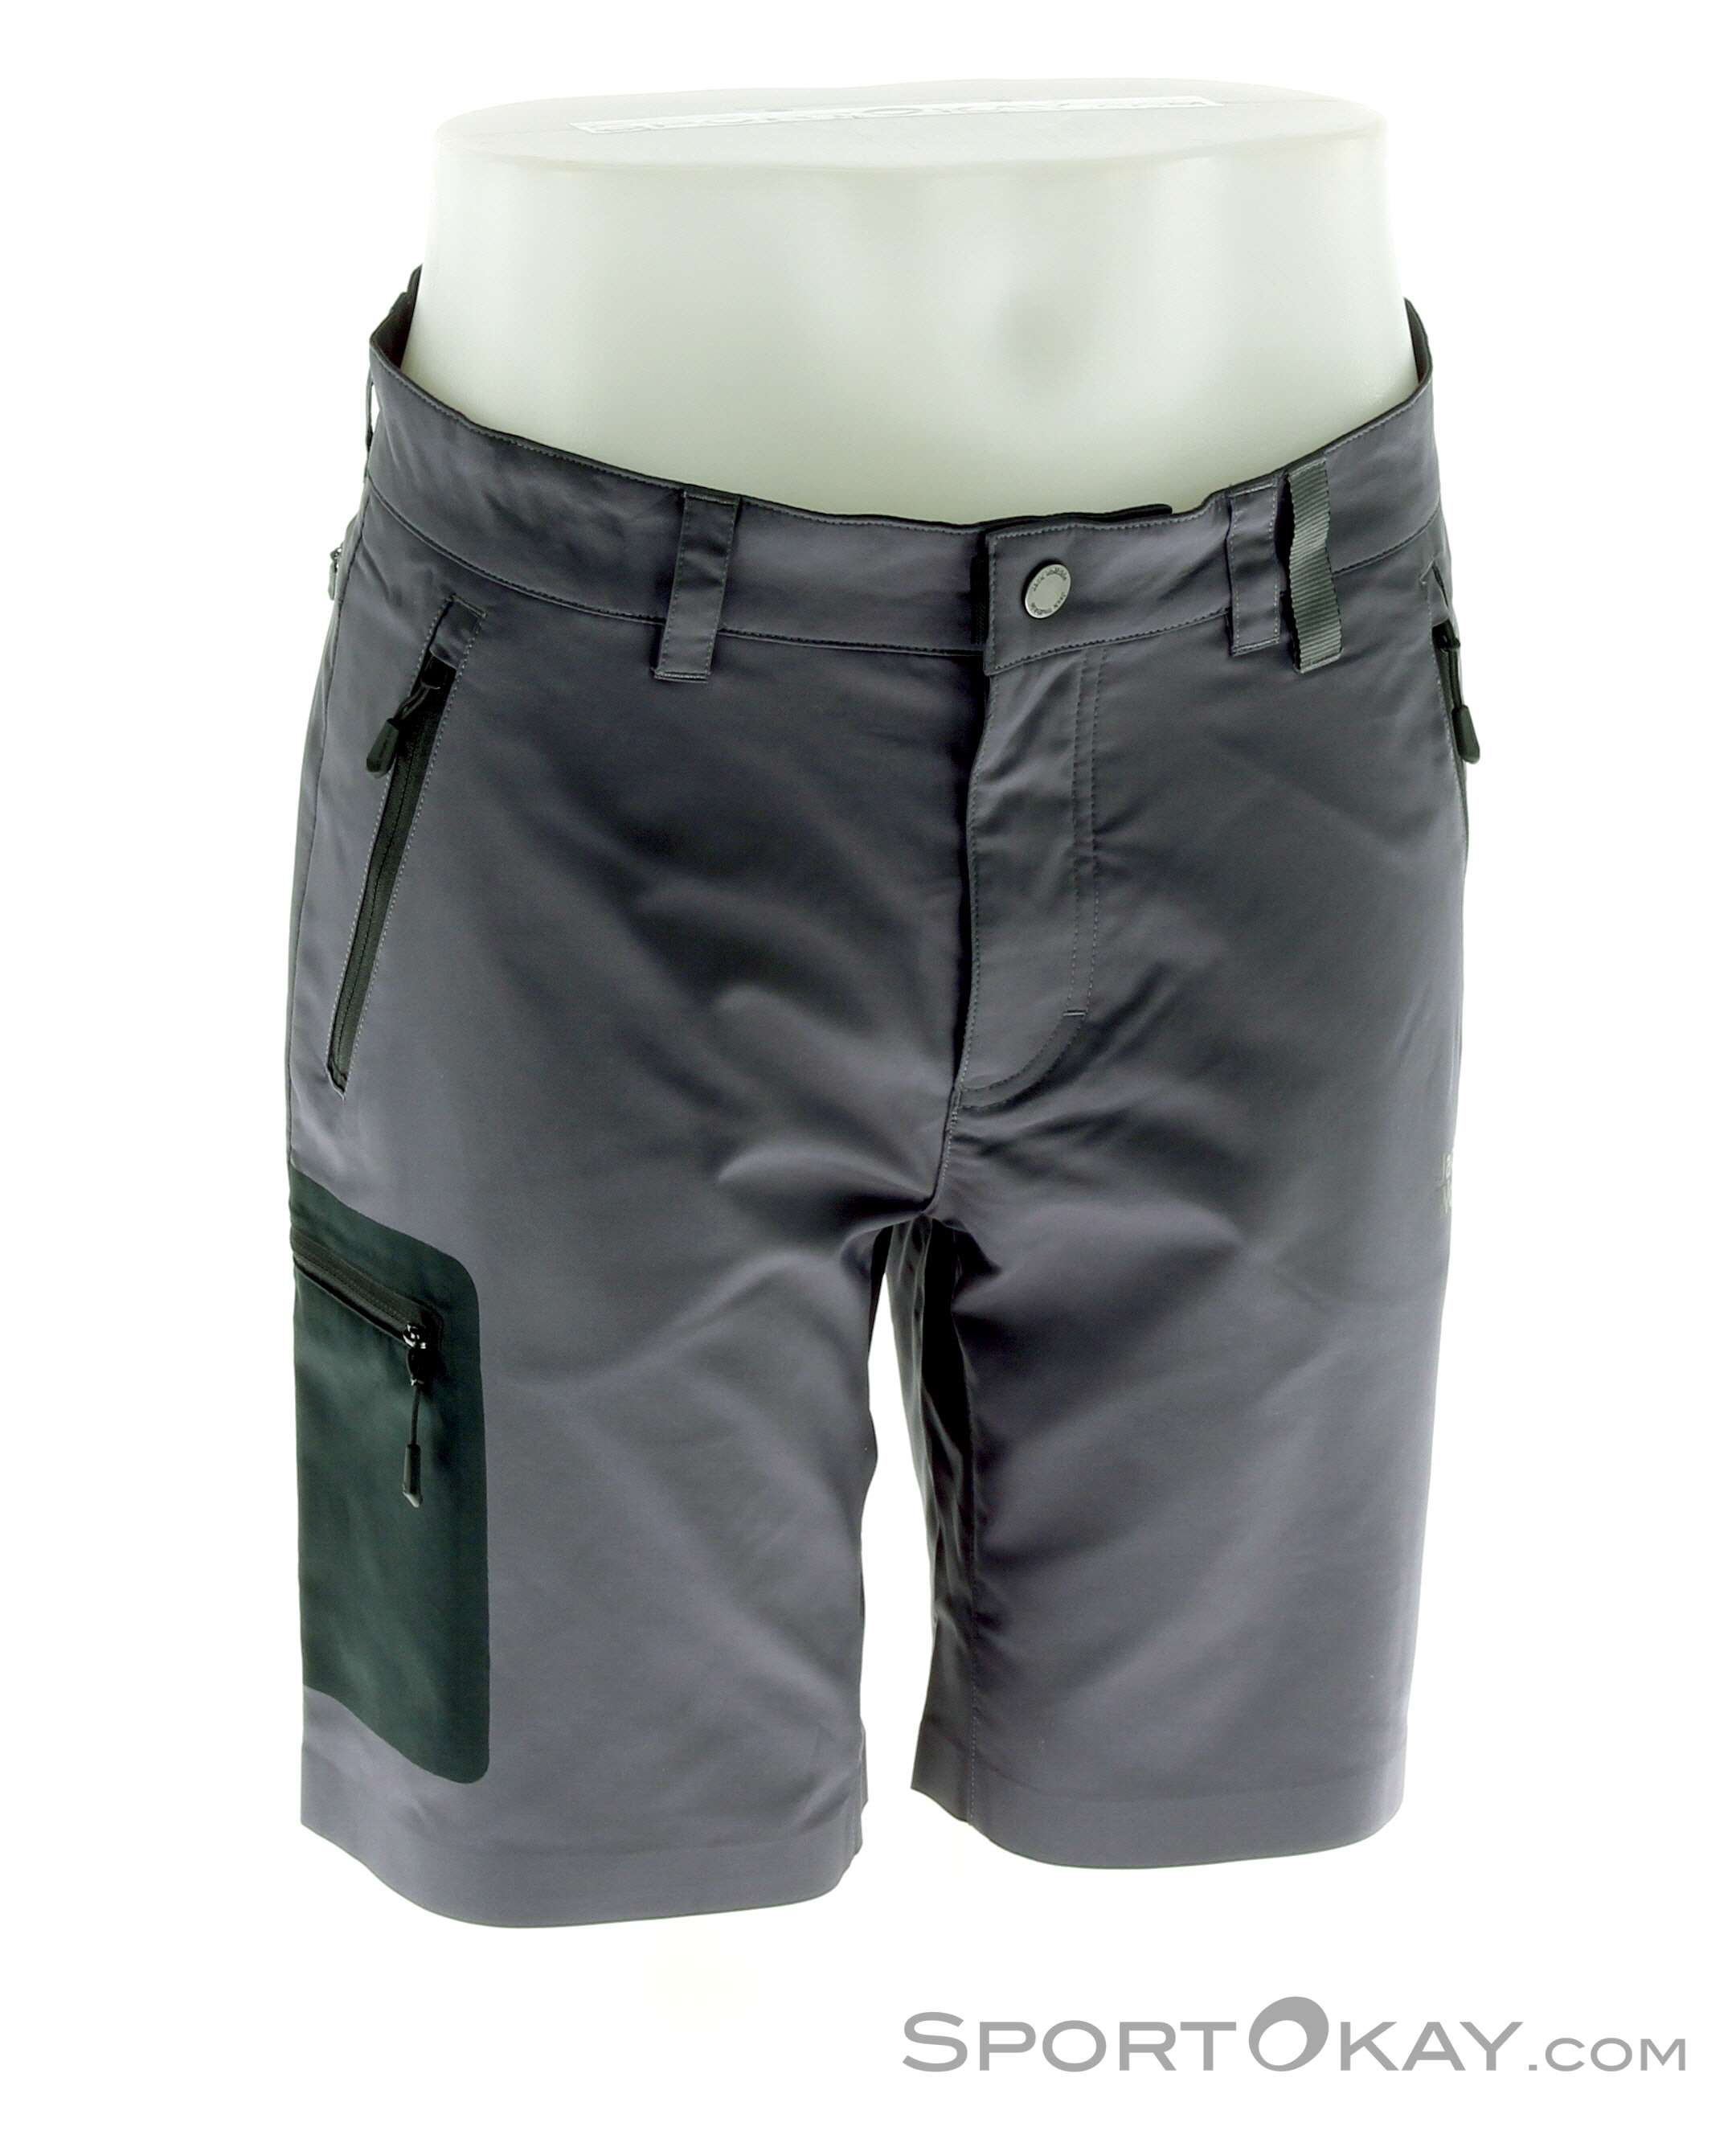 Shorts Jack Outdoor Active Wolfskin Track Mens yP8nwmN0Ov